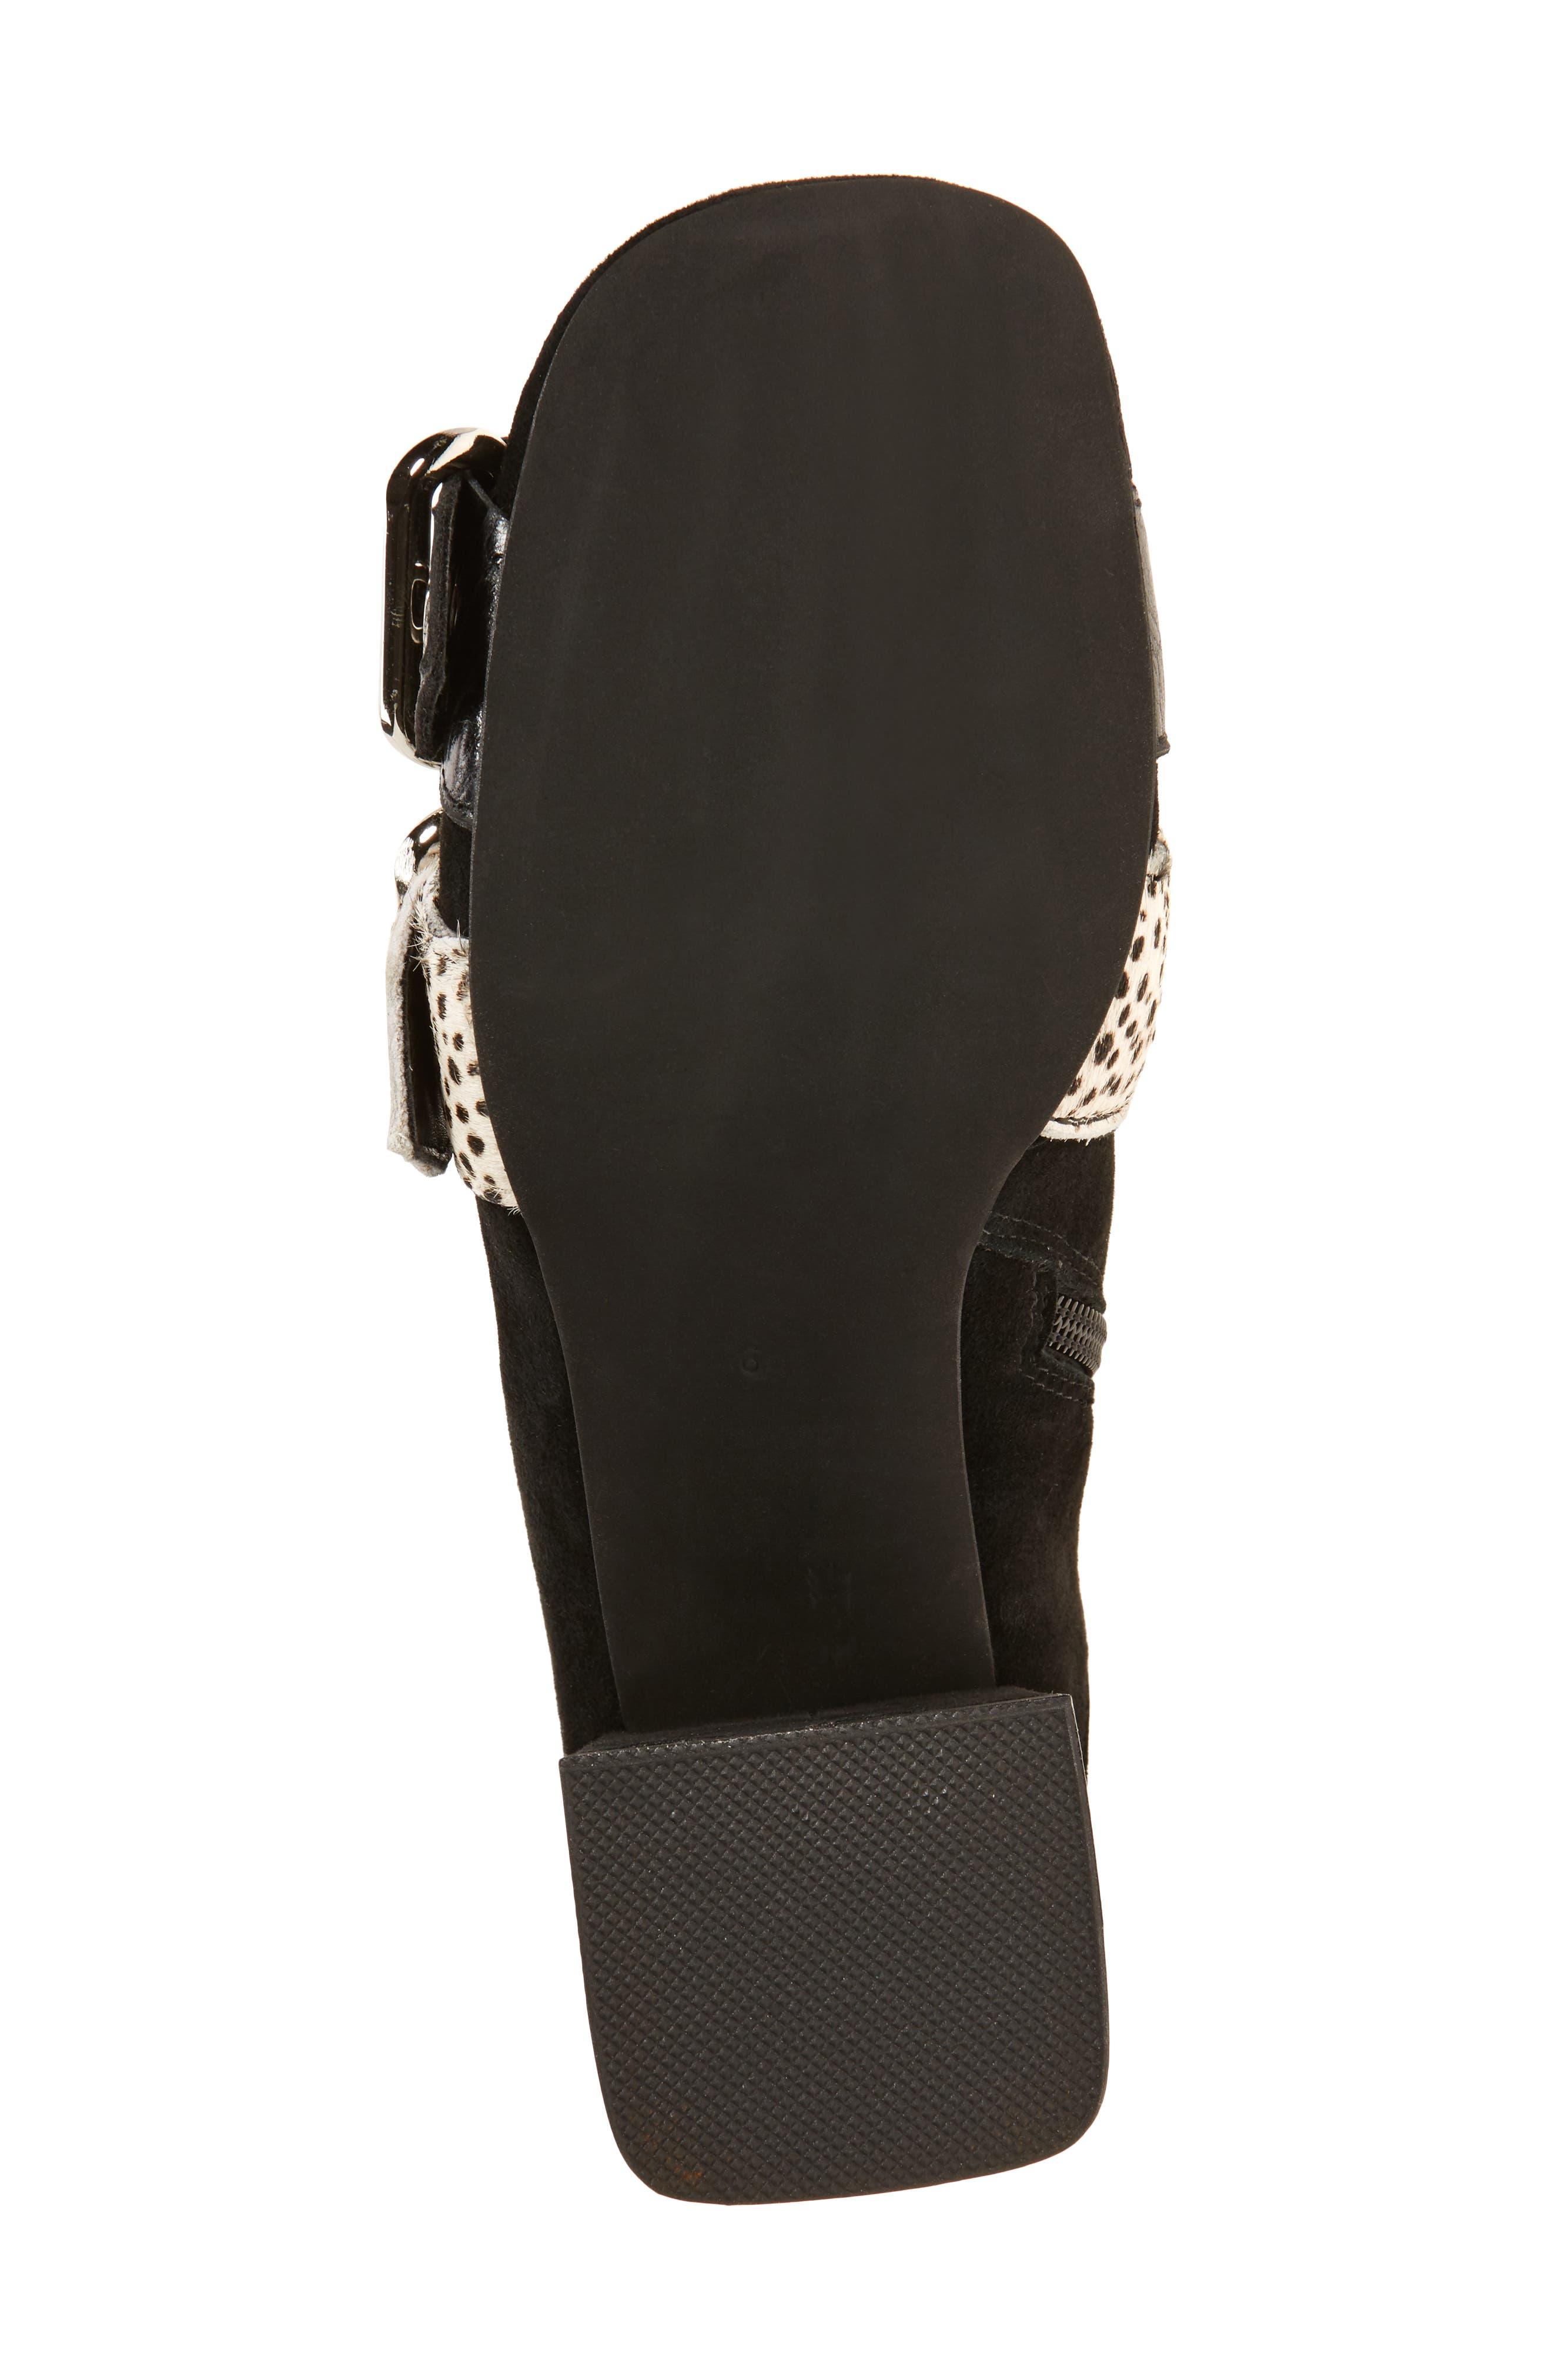 Peggy Genuine Calf Hair Boot,                             Alternate thumbnail 6, color,                             Black Suede Animal Multi